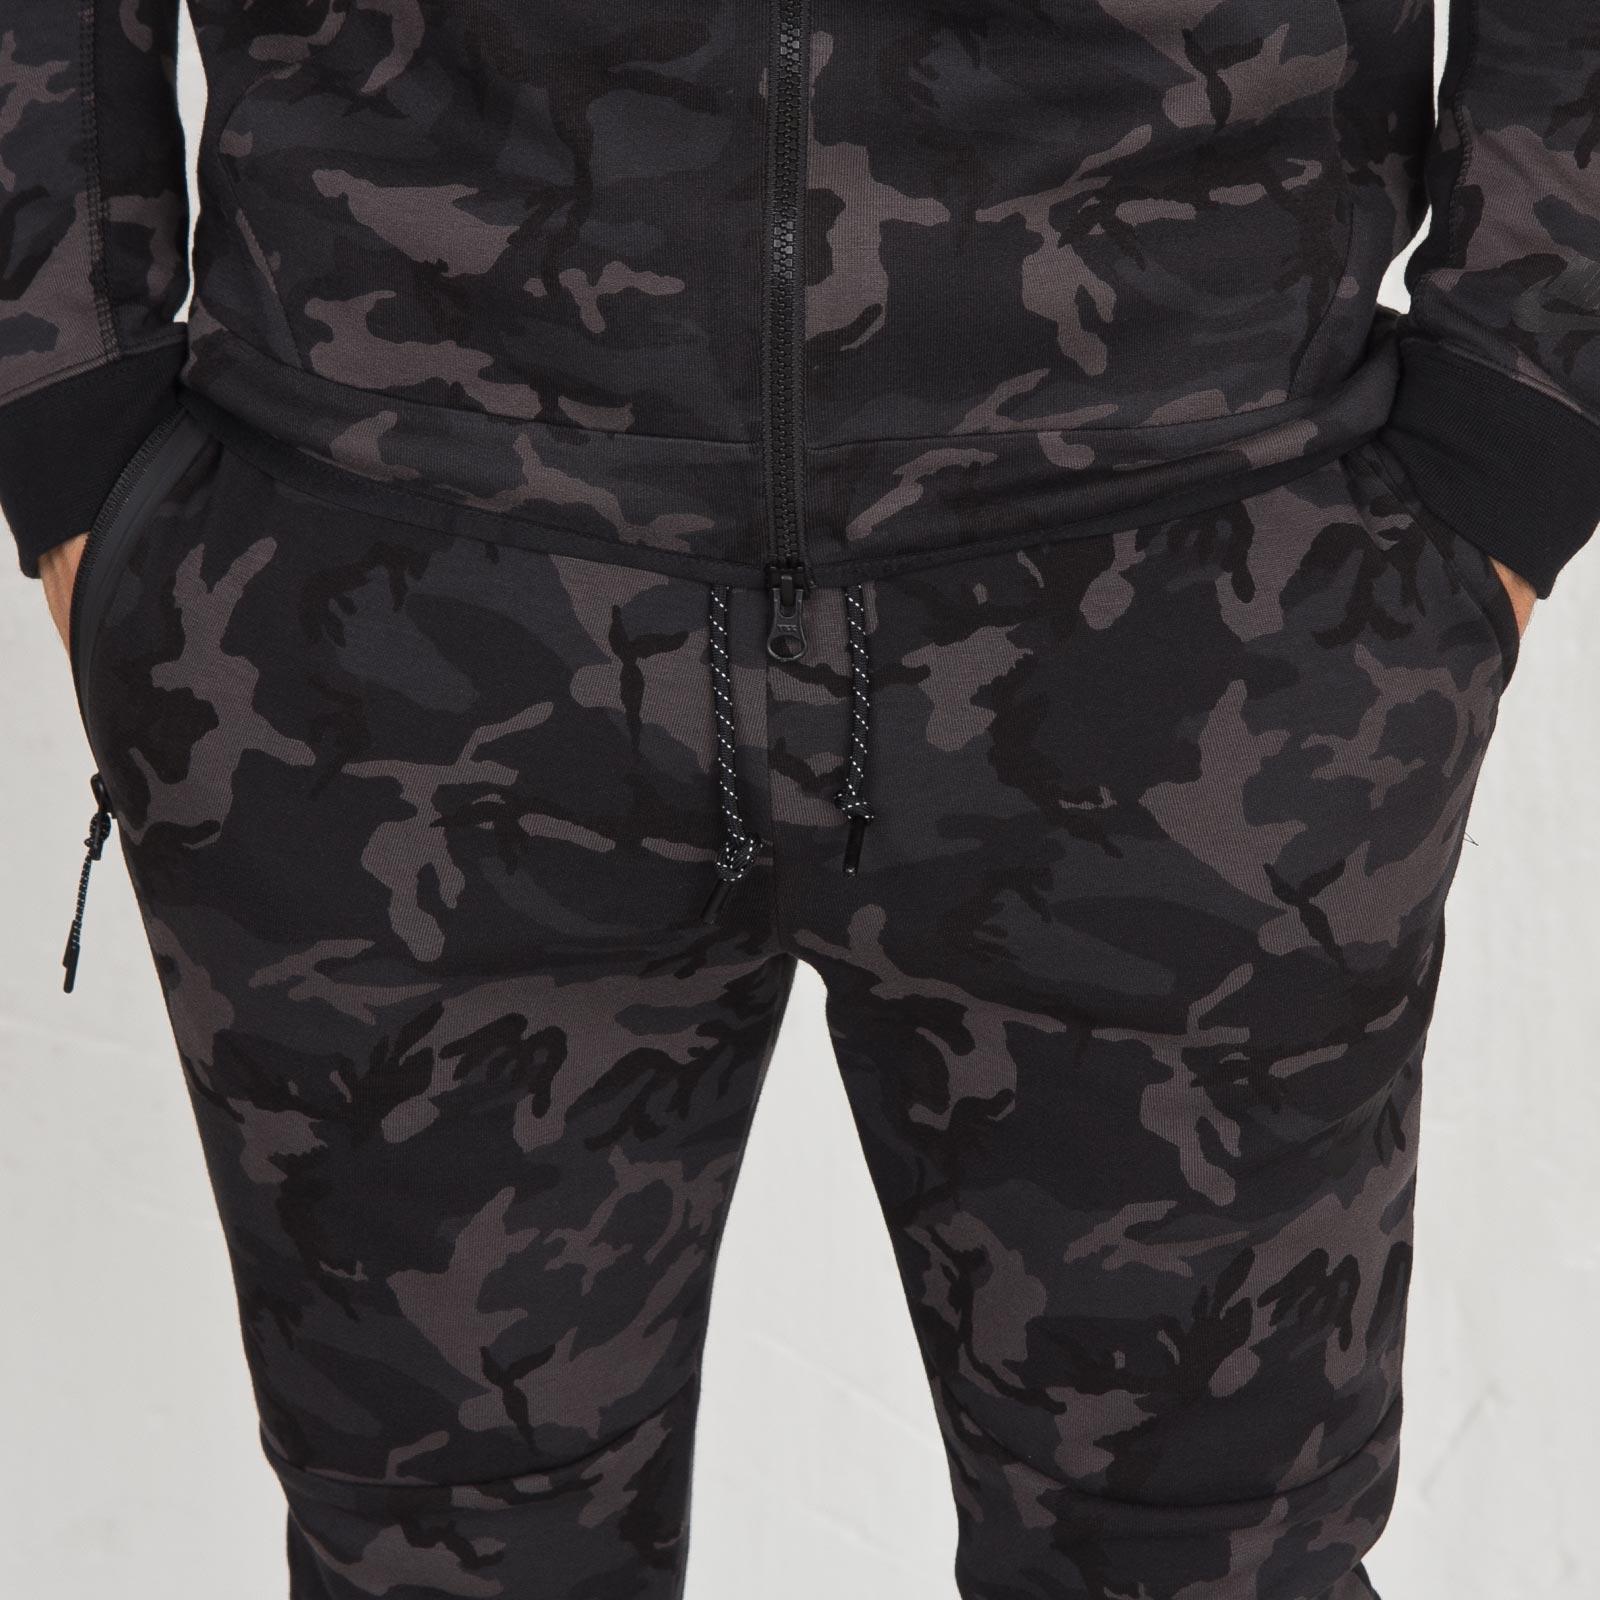 b249533a7045 Nike Tech Fleece Pant - Camo - 682852-233 - Sneakersnstuff ...